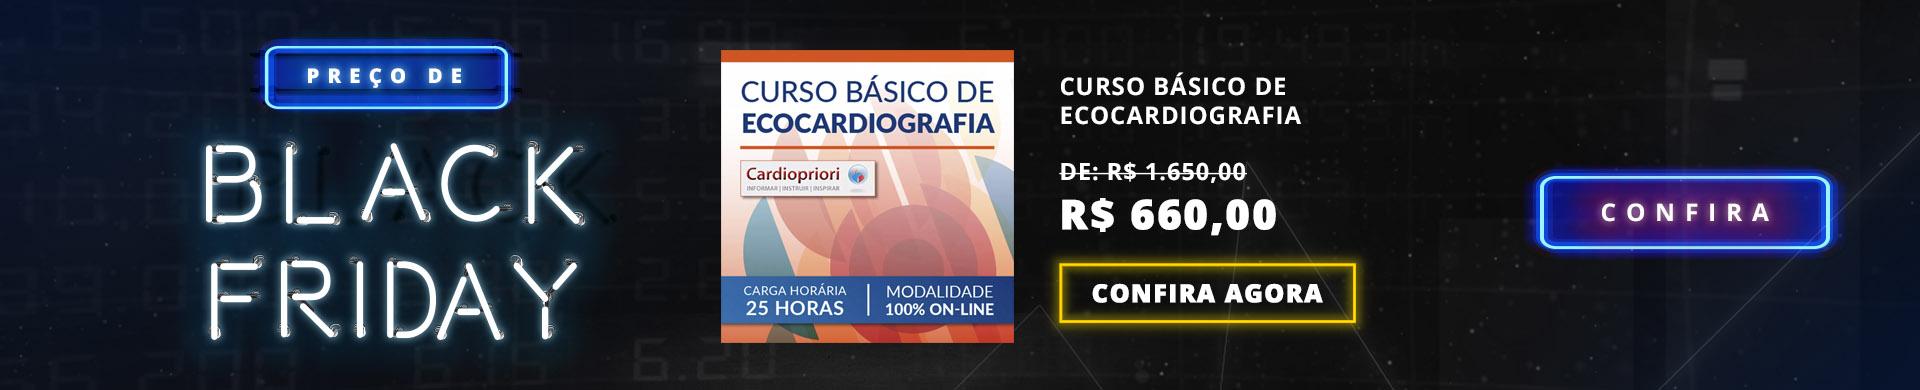 Esquenta - Black Friday -Básico de Ecocardiografia